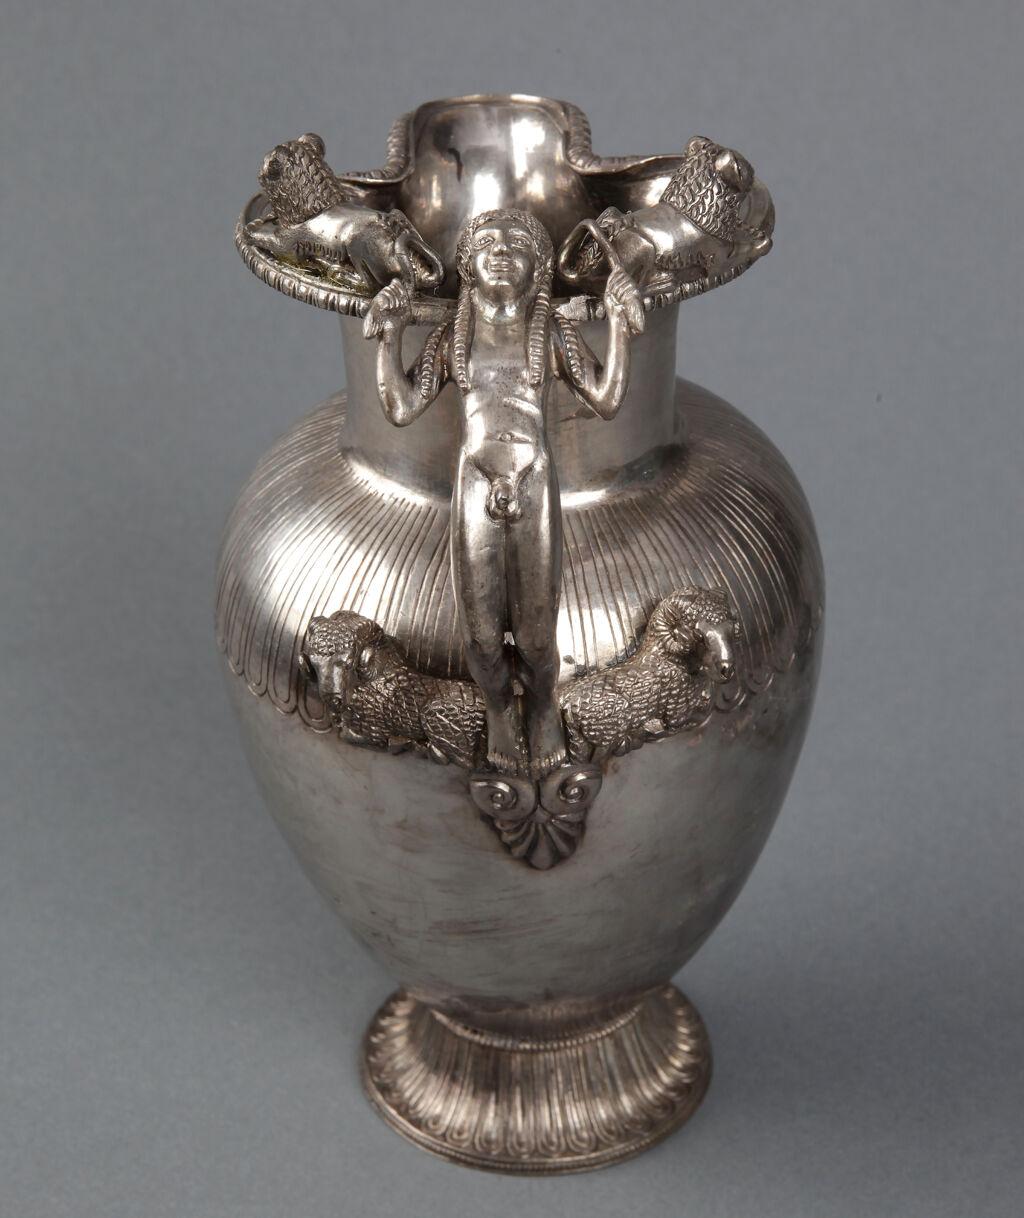 Kuros kulplu gümüş oinokhoe